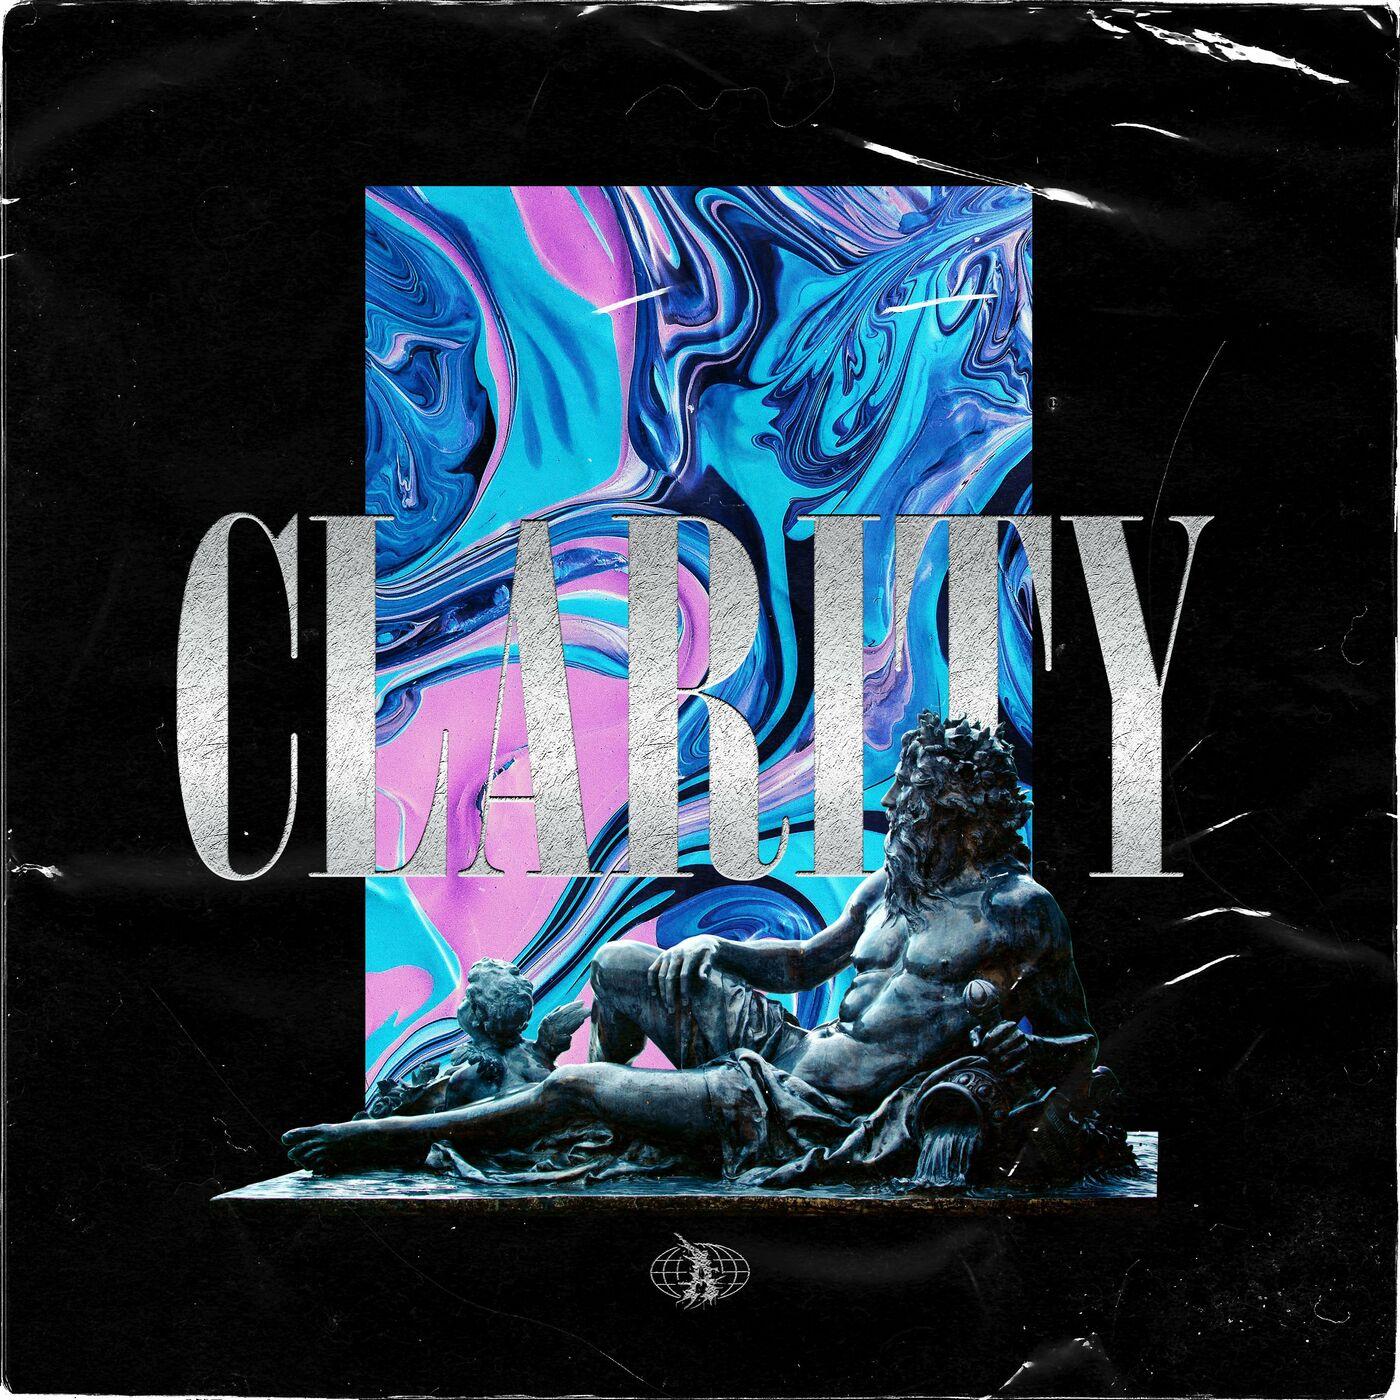 Attila - Clarity [single] (2021)